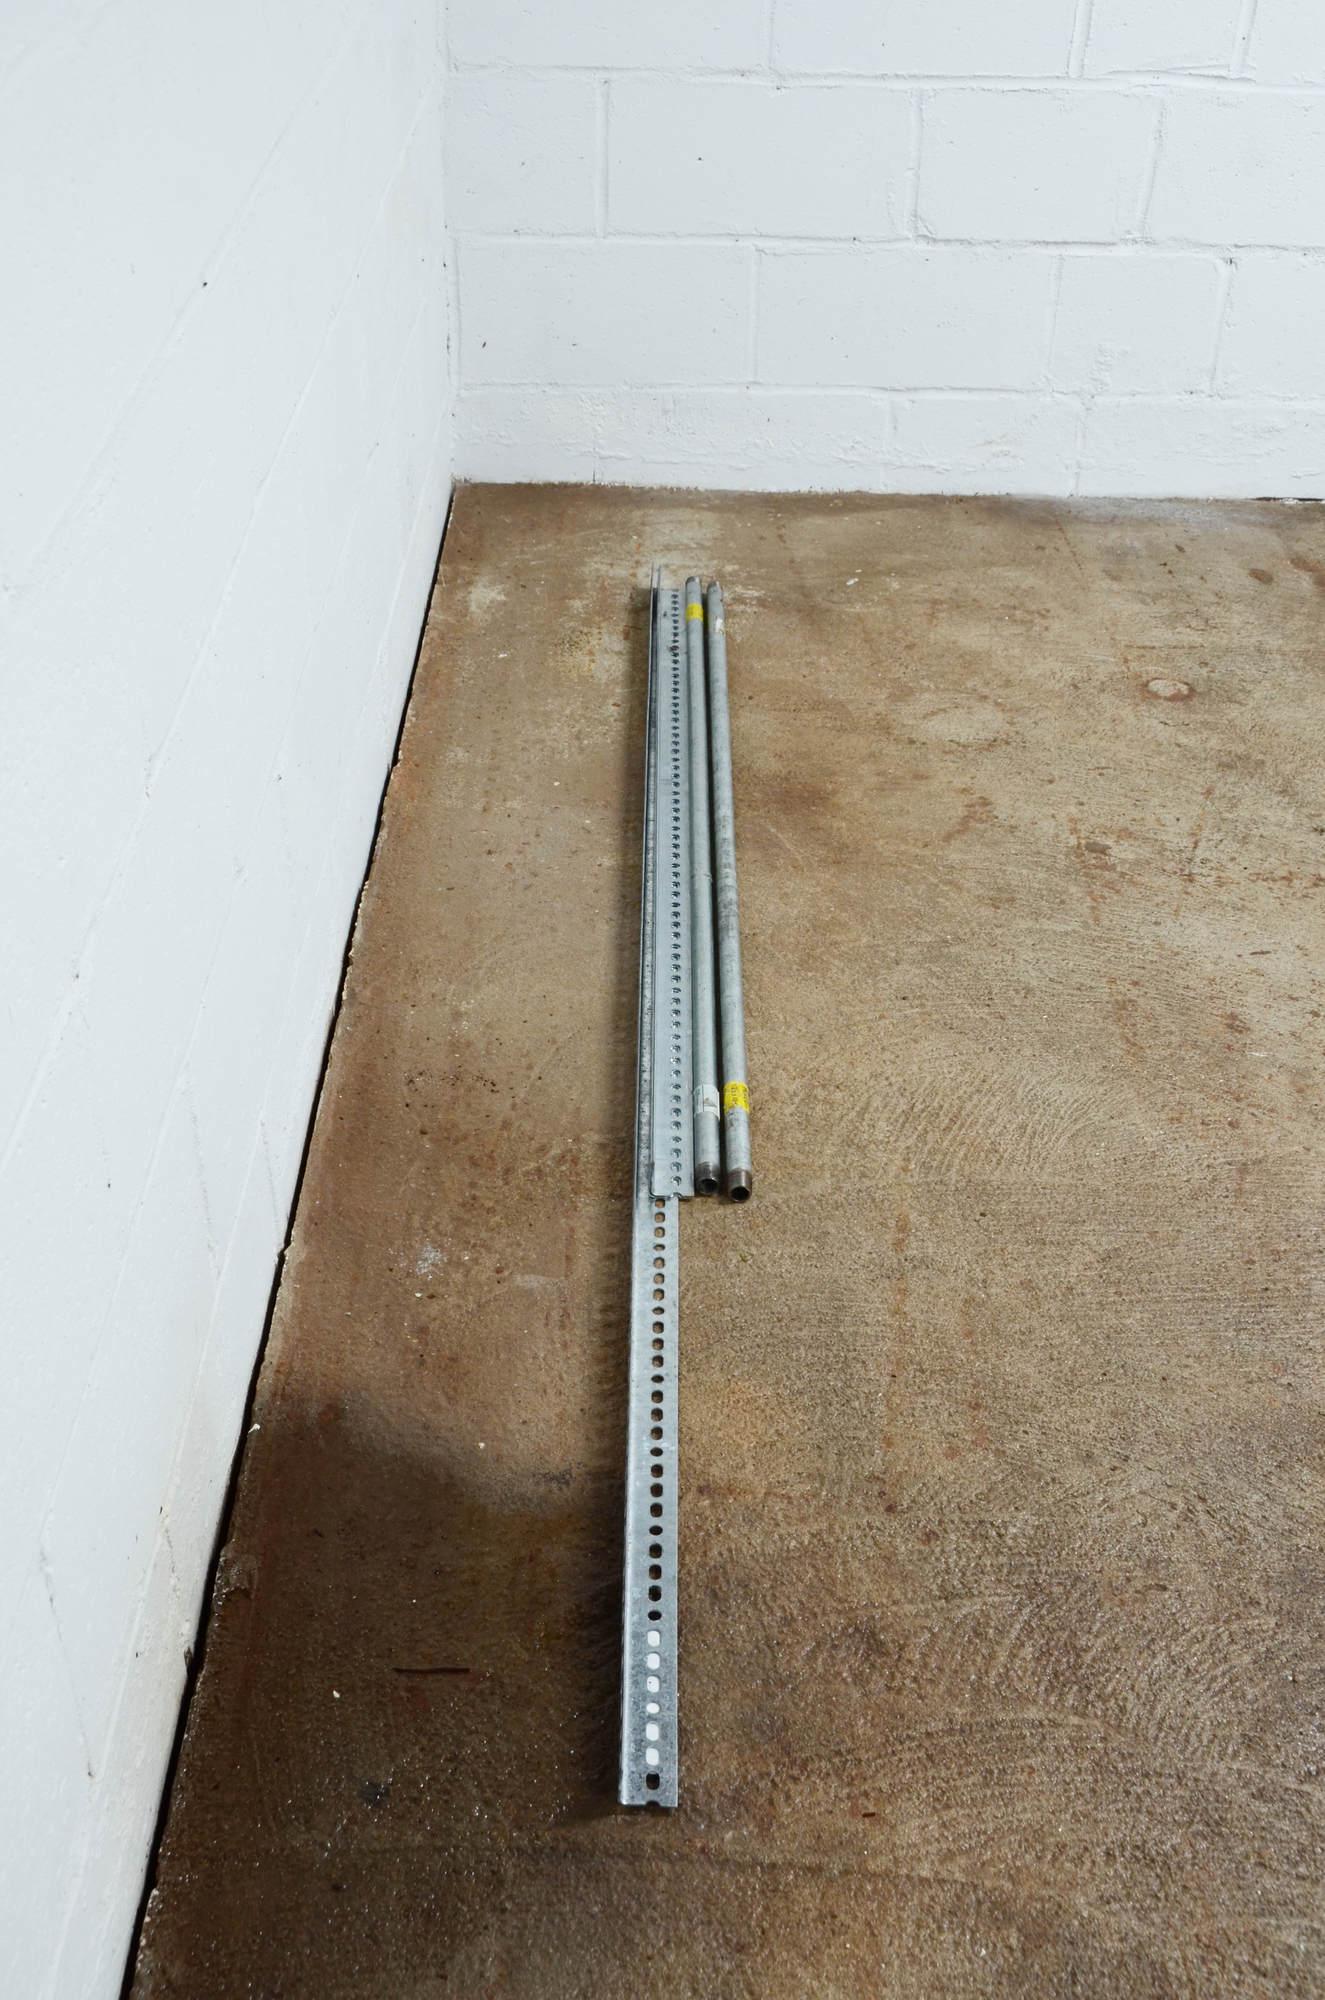 Electrical Wiring Conduit Greenfield Wire Jamie Sneider At Wreath Artviewer Org Garage Surface 1325x2000